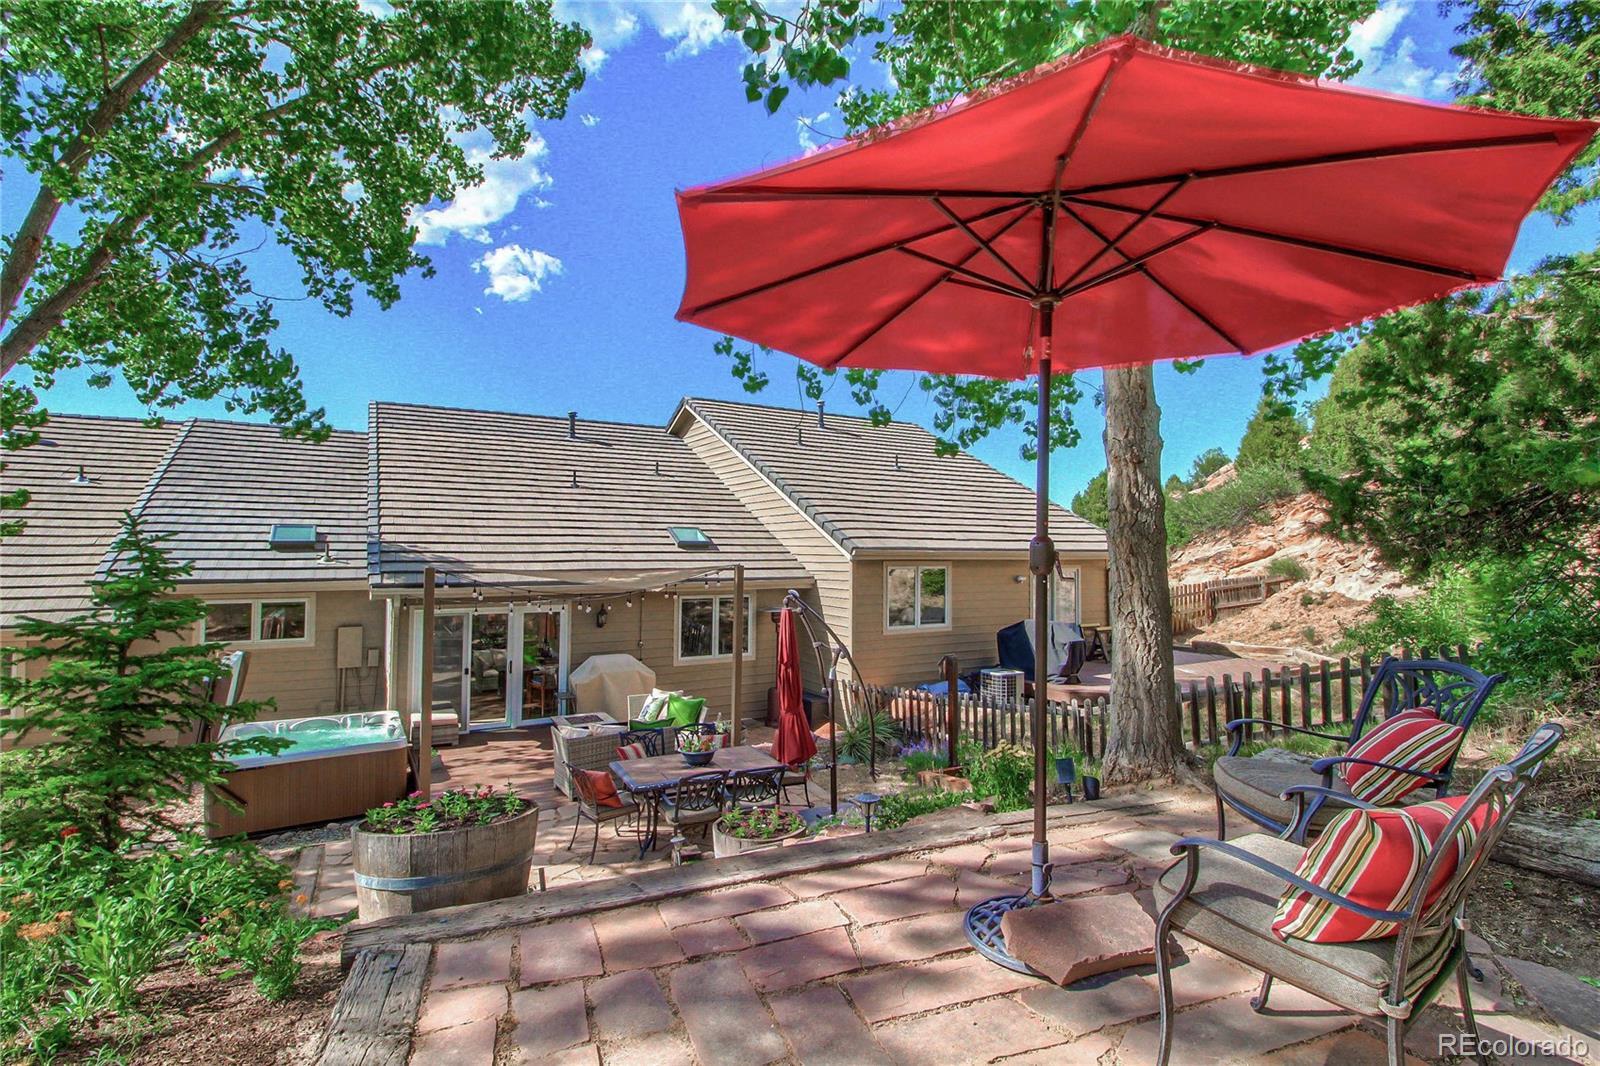 MLS# 8915656 - 33 - 6841 Briar Rose Trail, Littleton, CO 80125